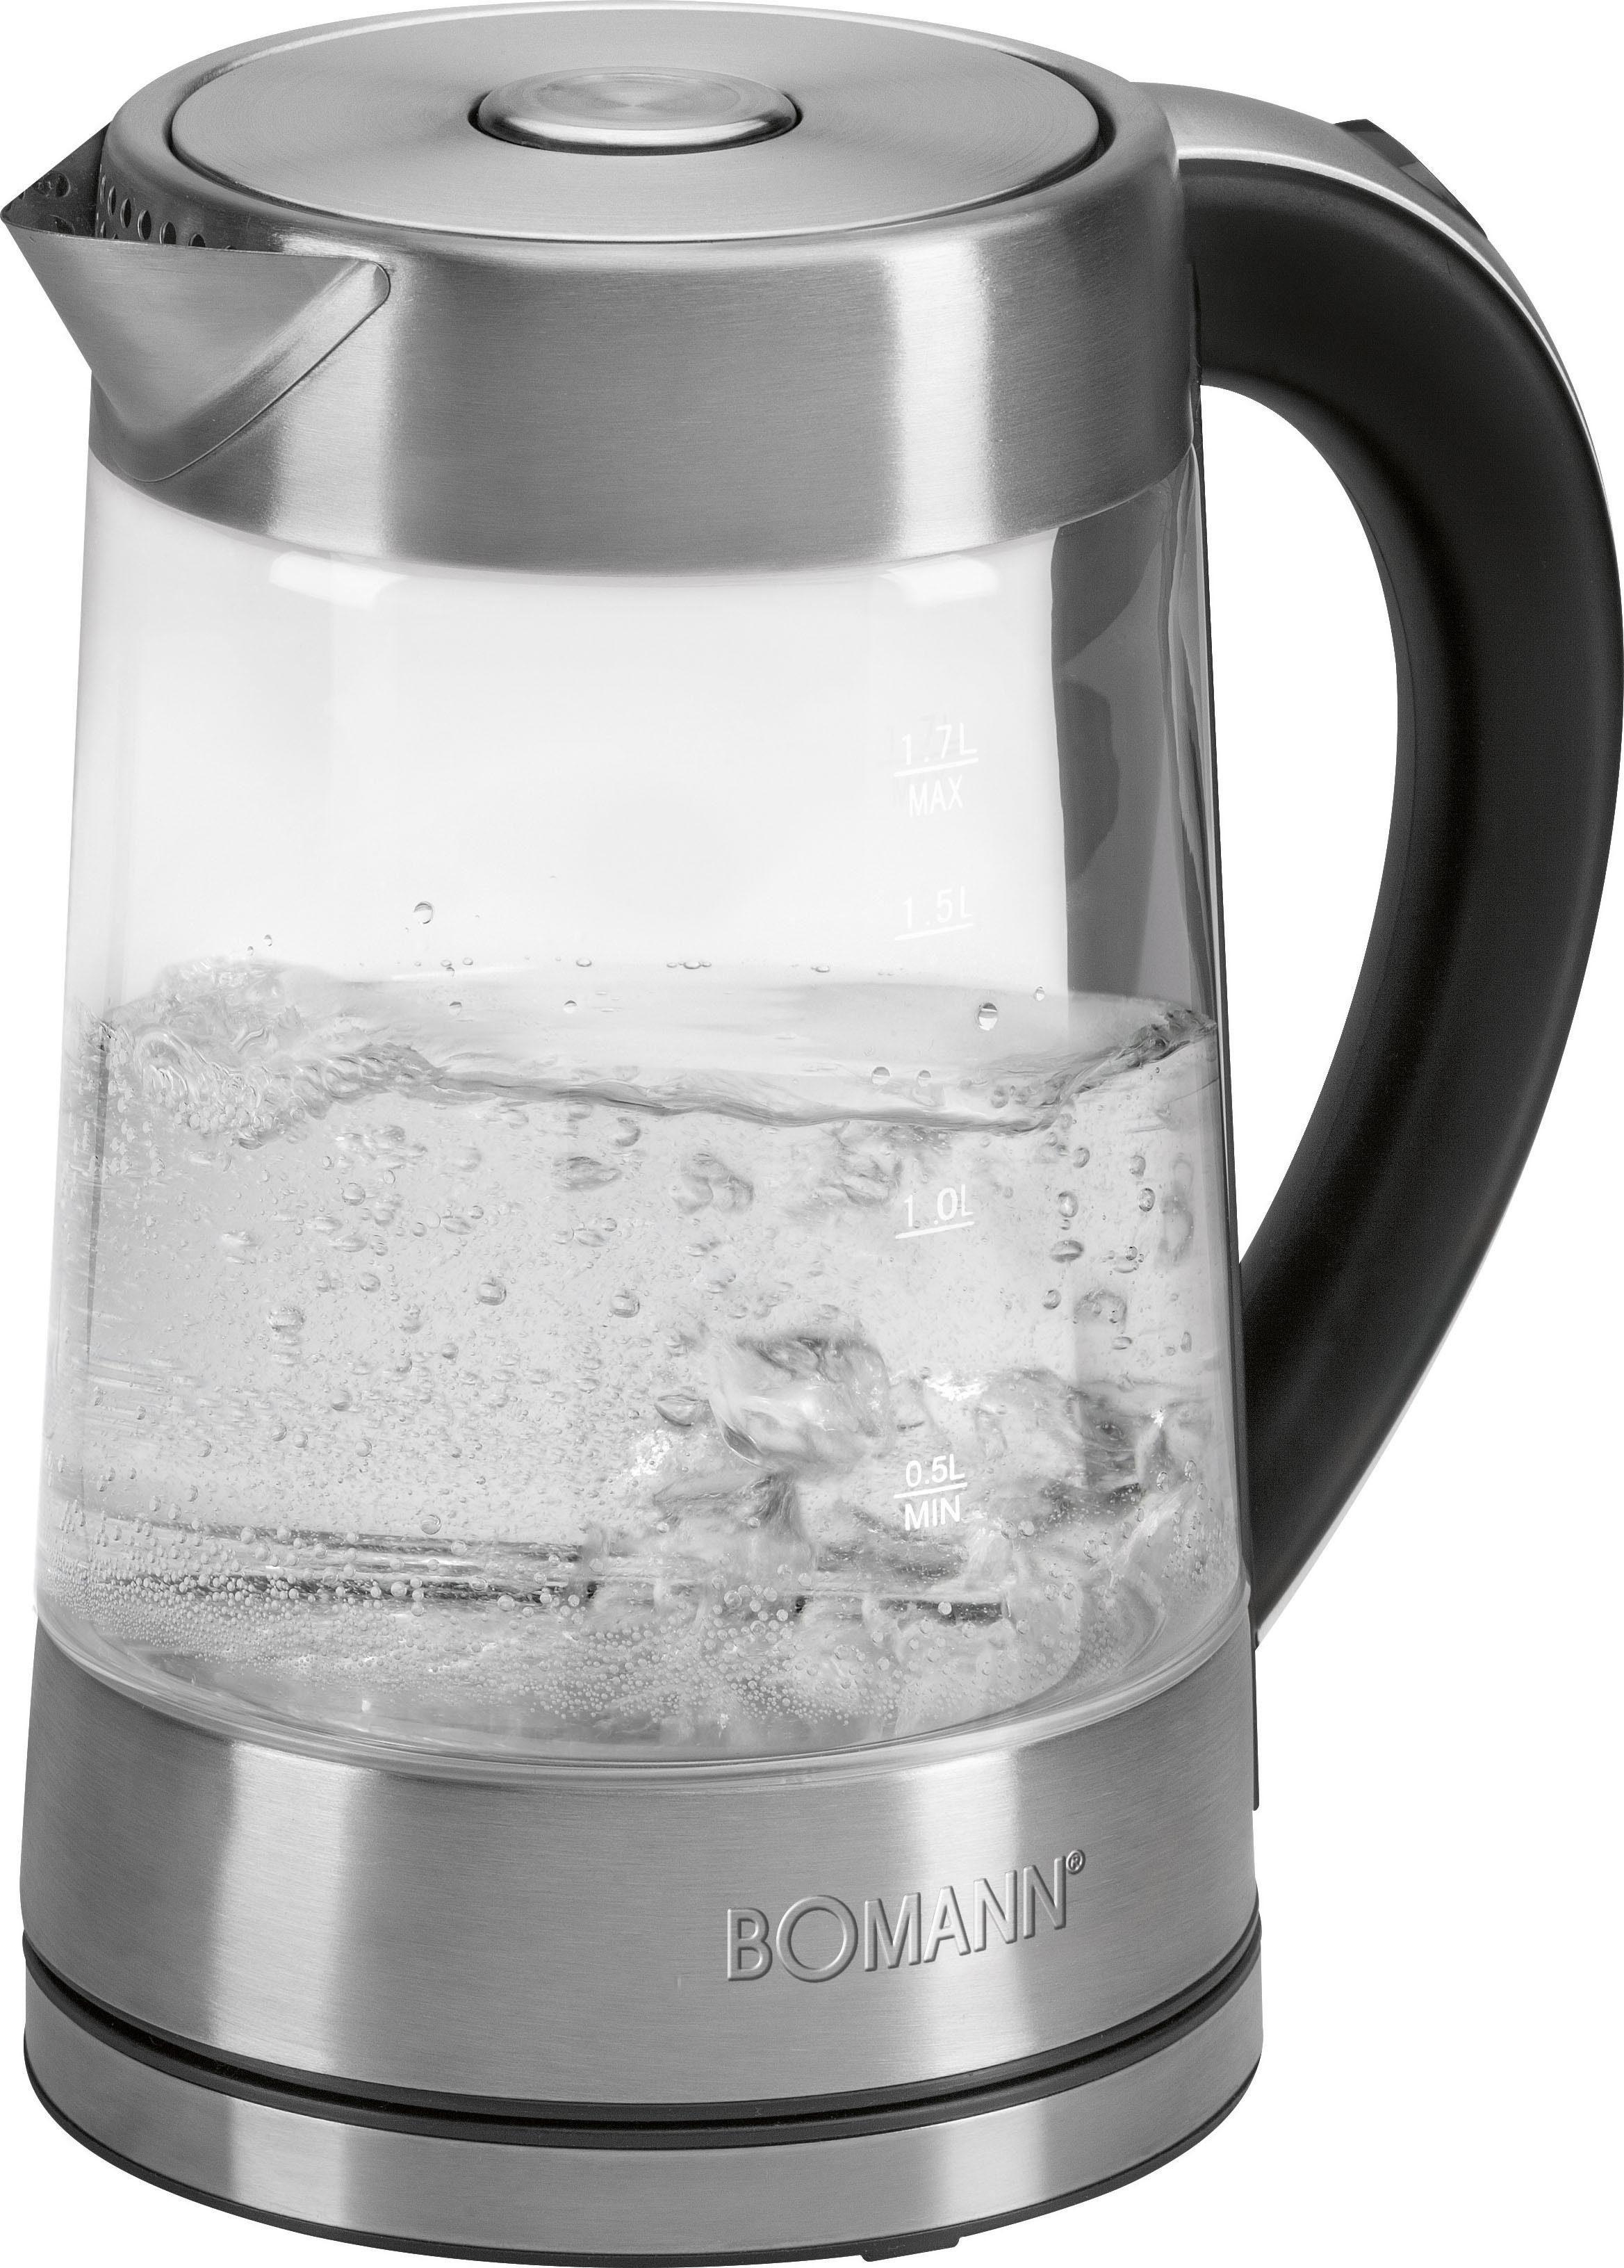 BOMANN Wasserkocher WK5023GCB, 1,7 l, 2200 W